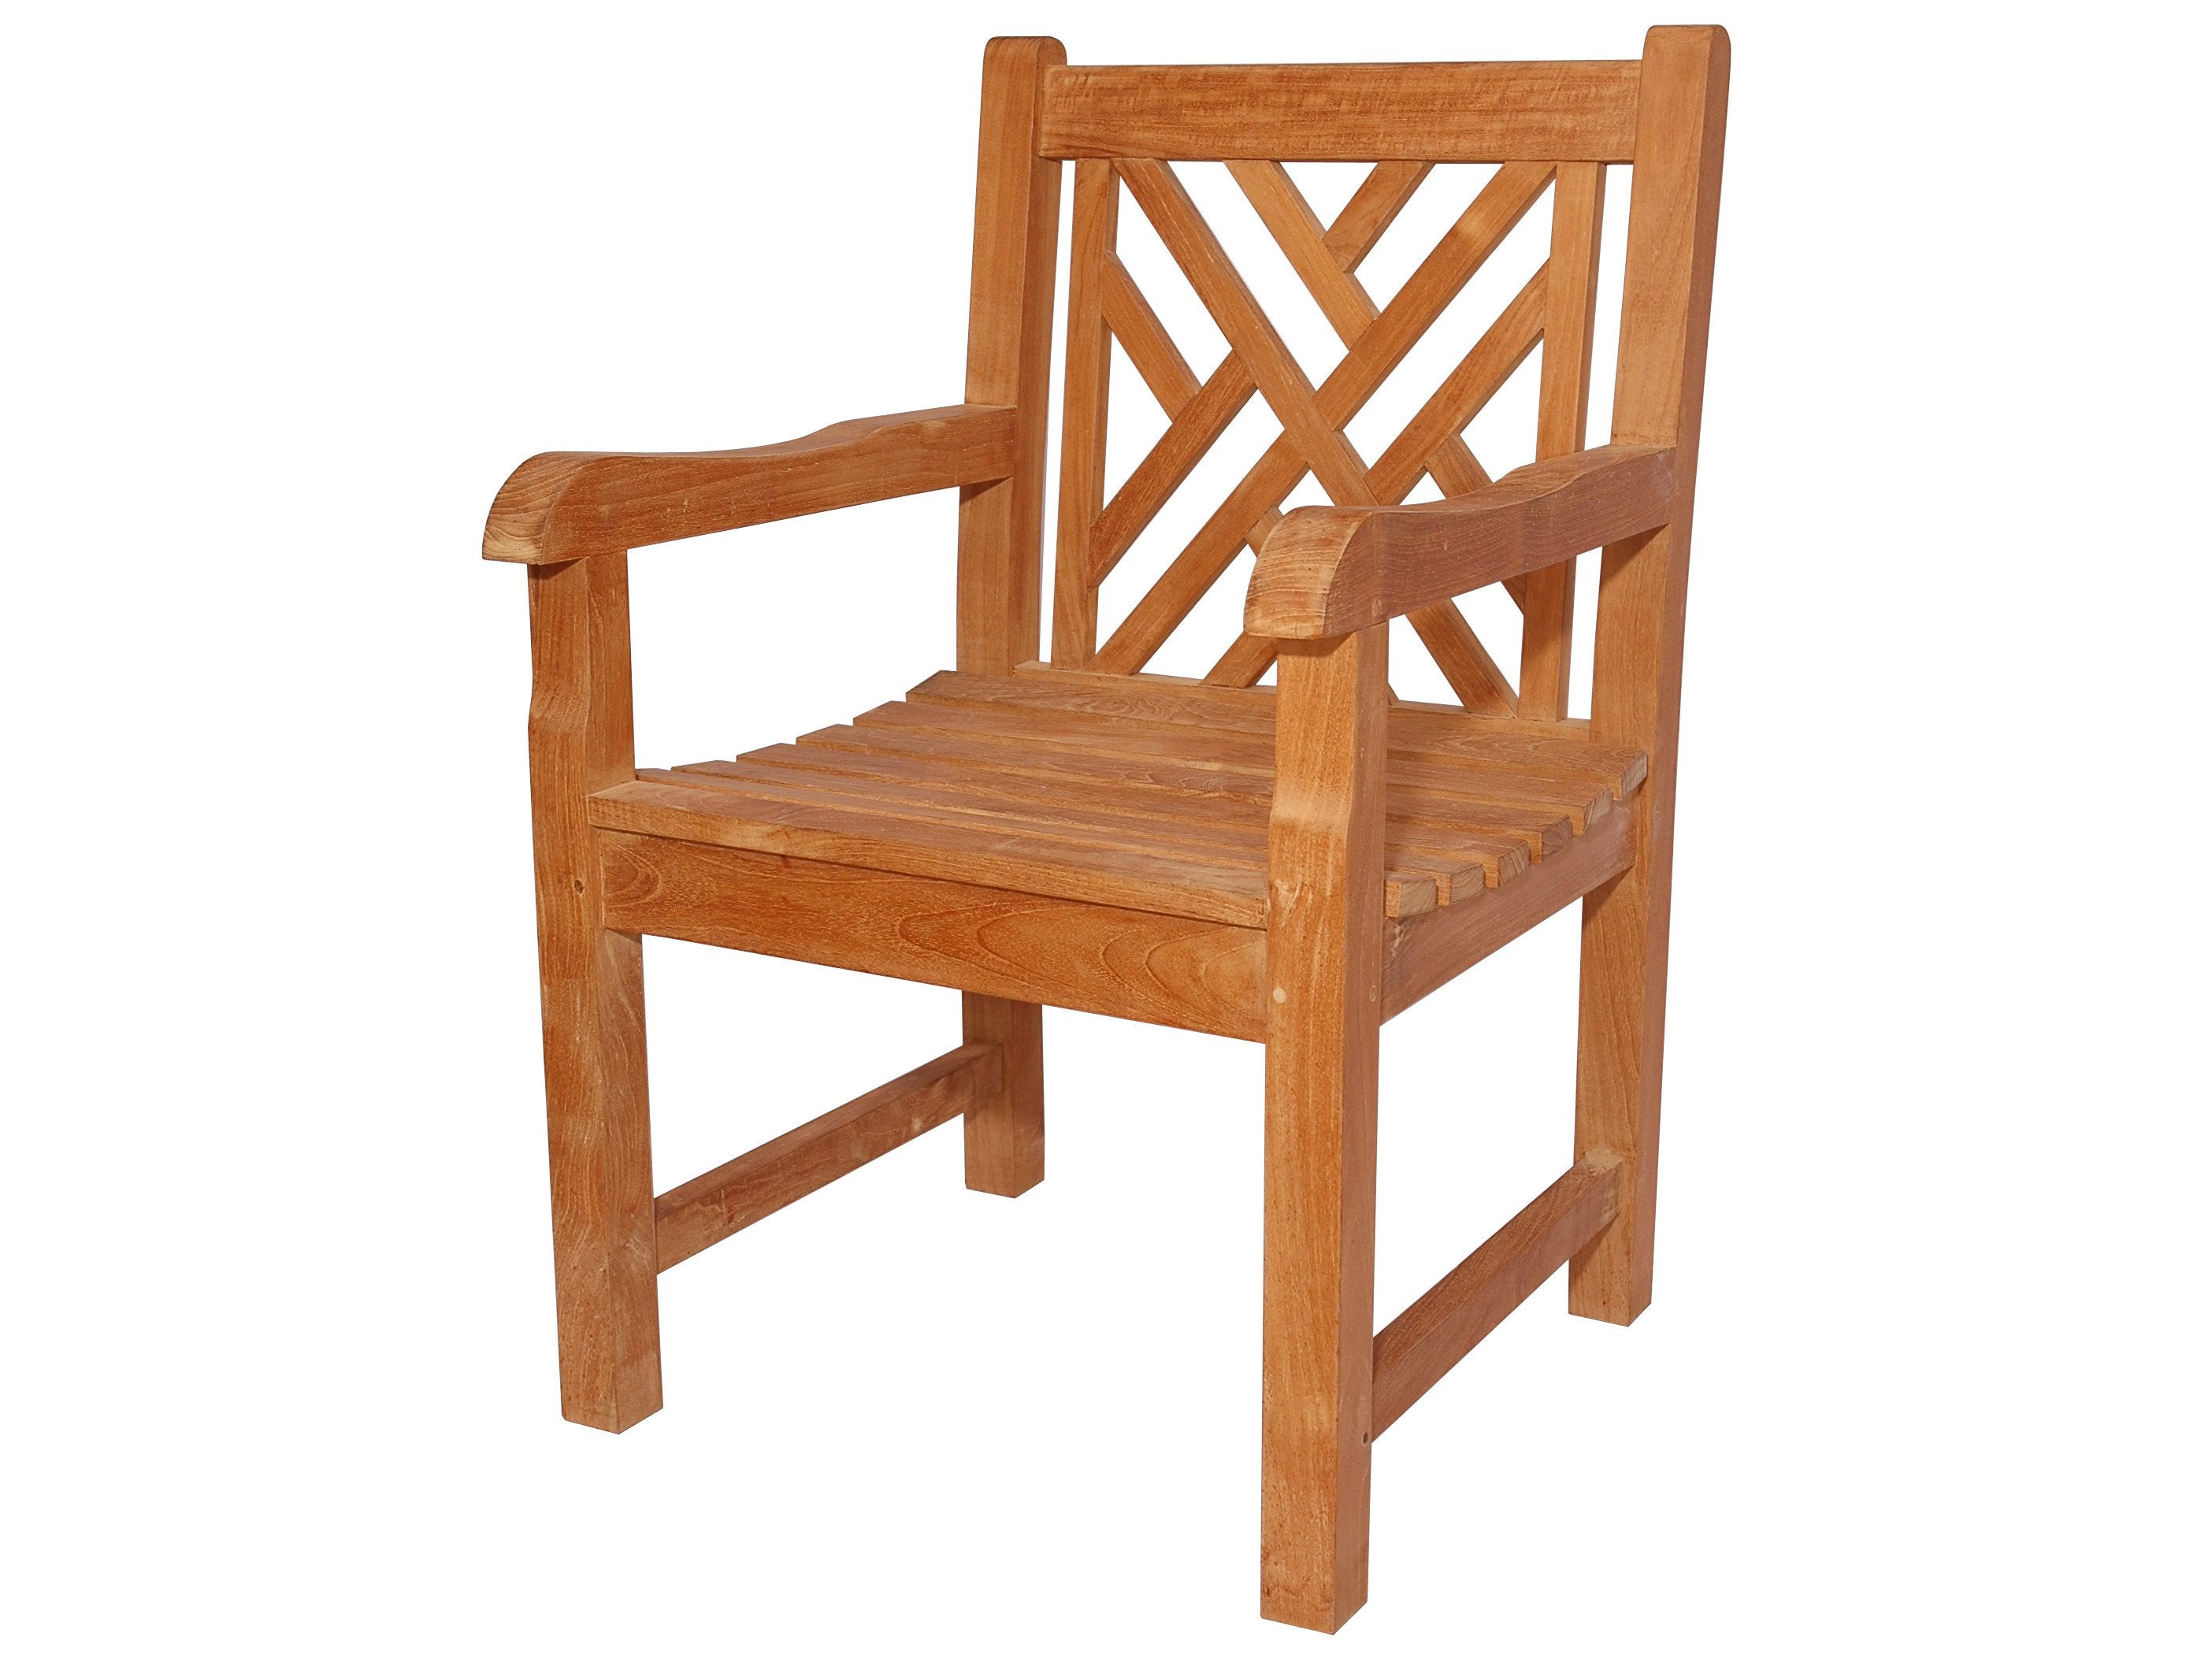 Anderson Teak Vilano Dining Chairs Chd 120